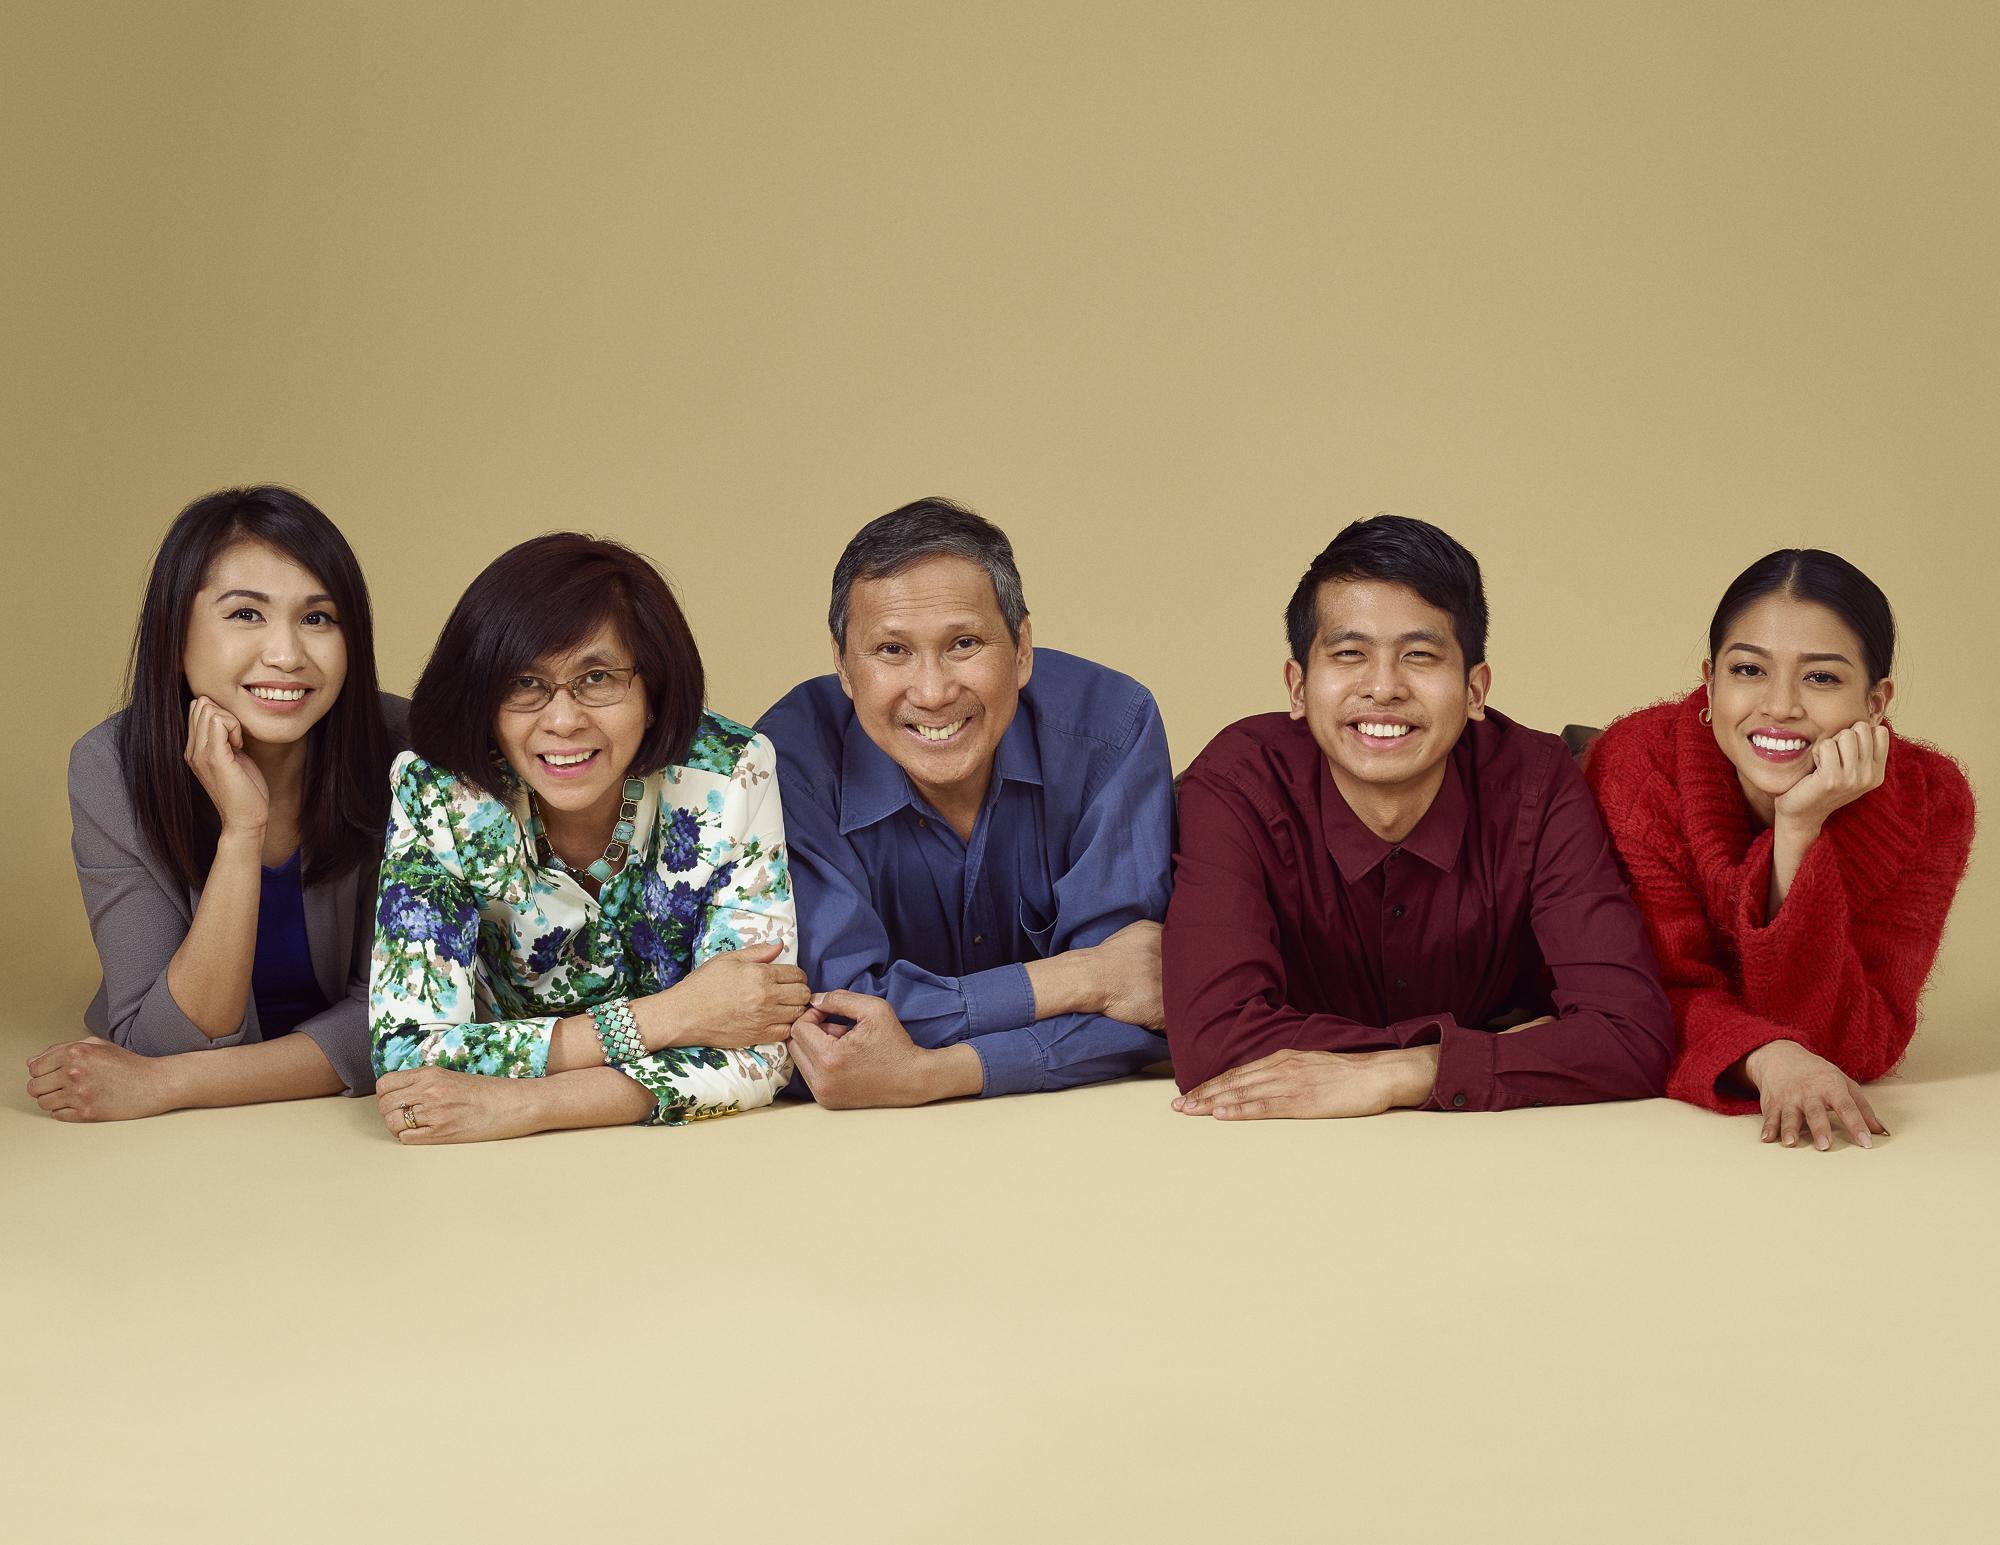 corporate business headshots portrait acting family professional photography photographer toronto studio